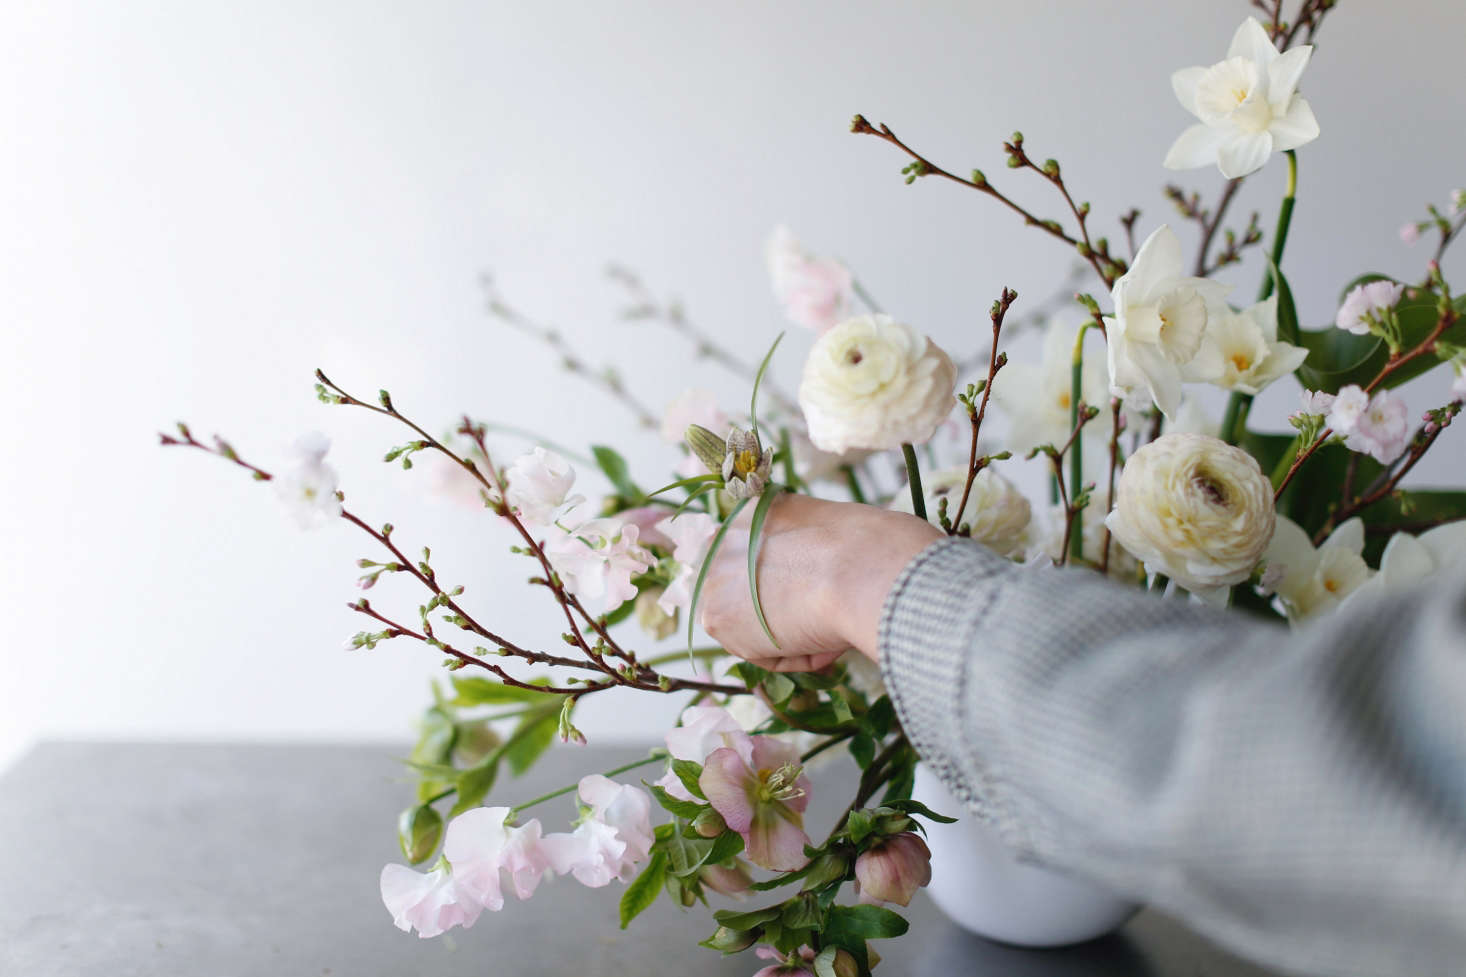 Flower Arrangements 101: A Crash Course for Easy and Elegant Florals ...